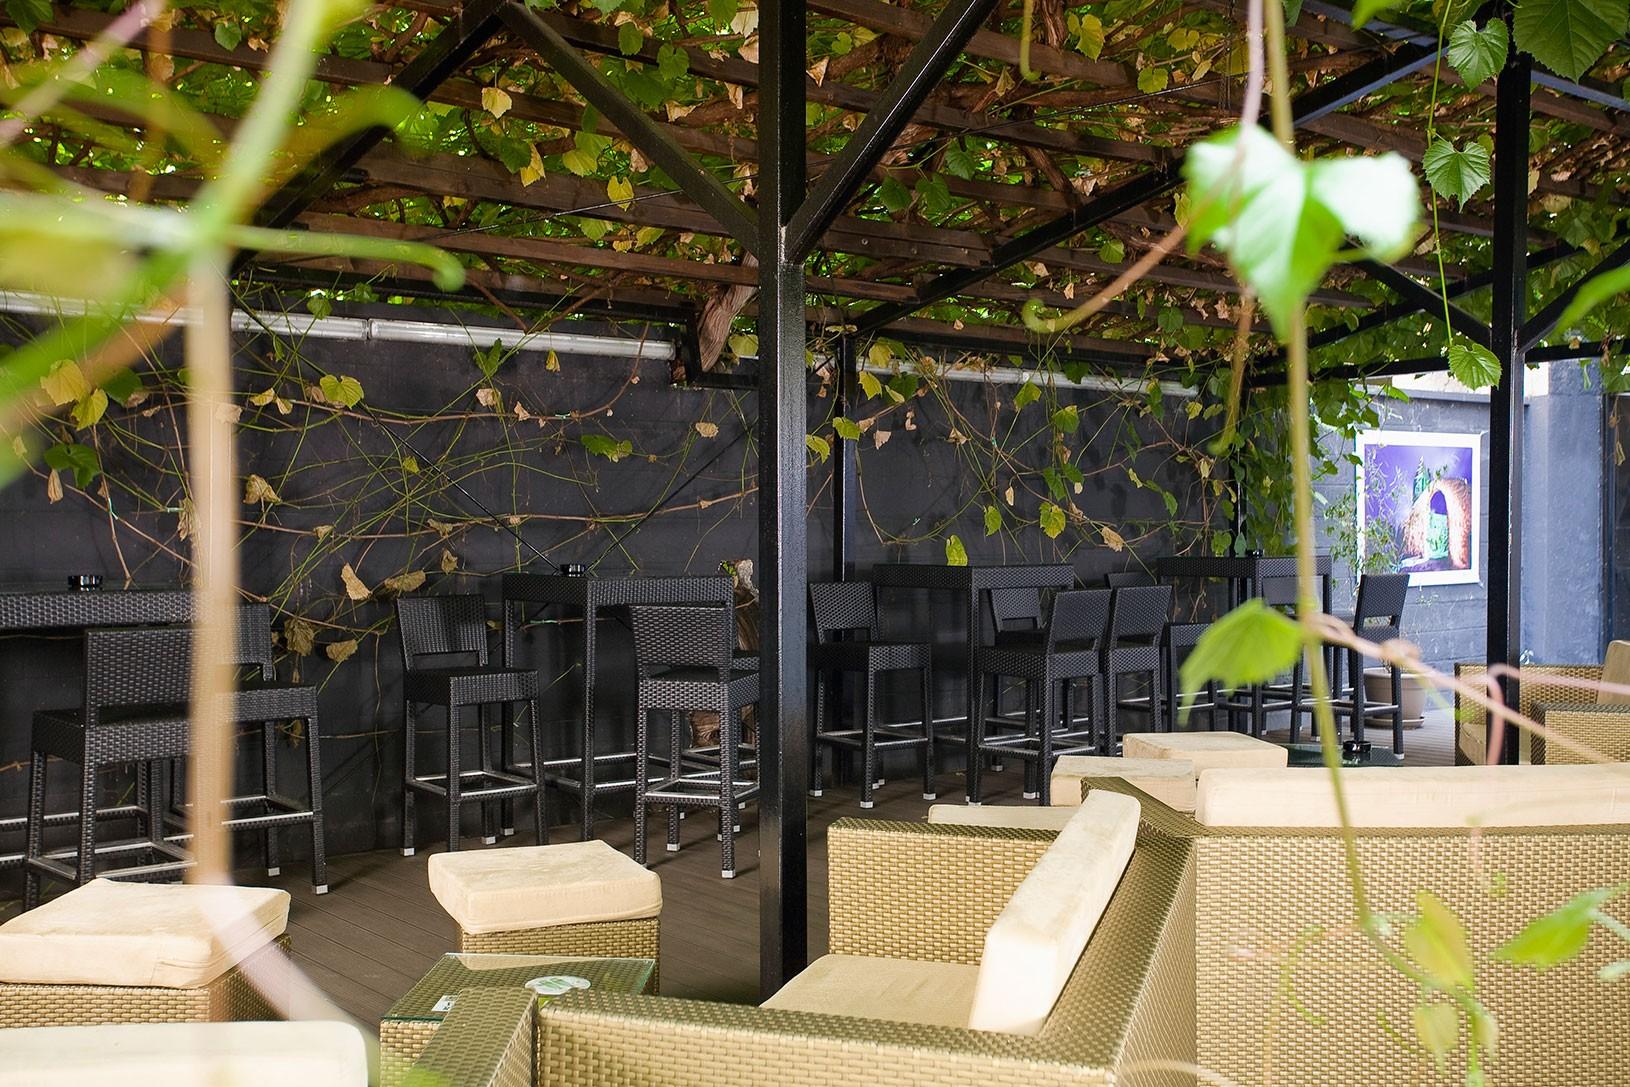 kota,KÔTA caffe bar, UPI-2M, caffe bar, zagreb, croatia, hrvatska, arhitektura, architecture, bar, medulićeva